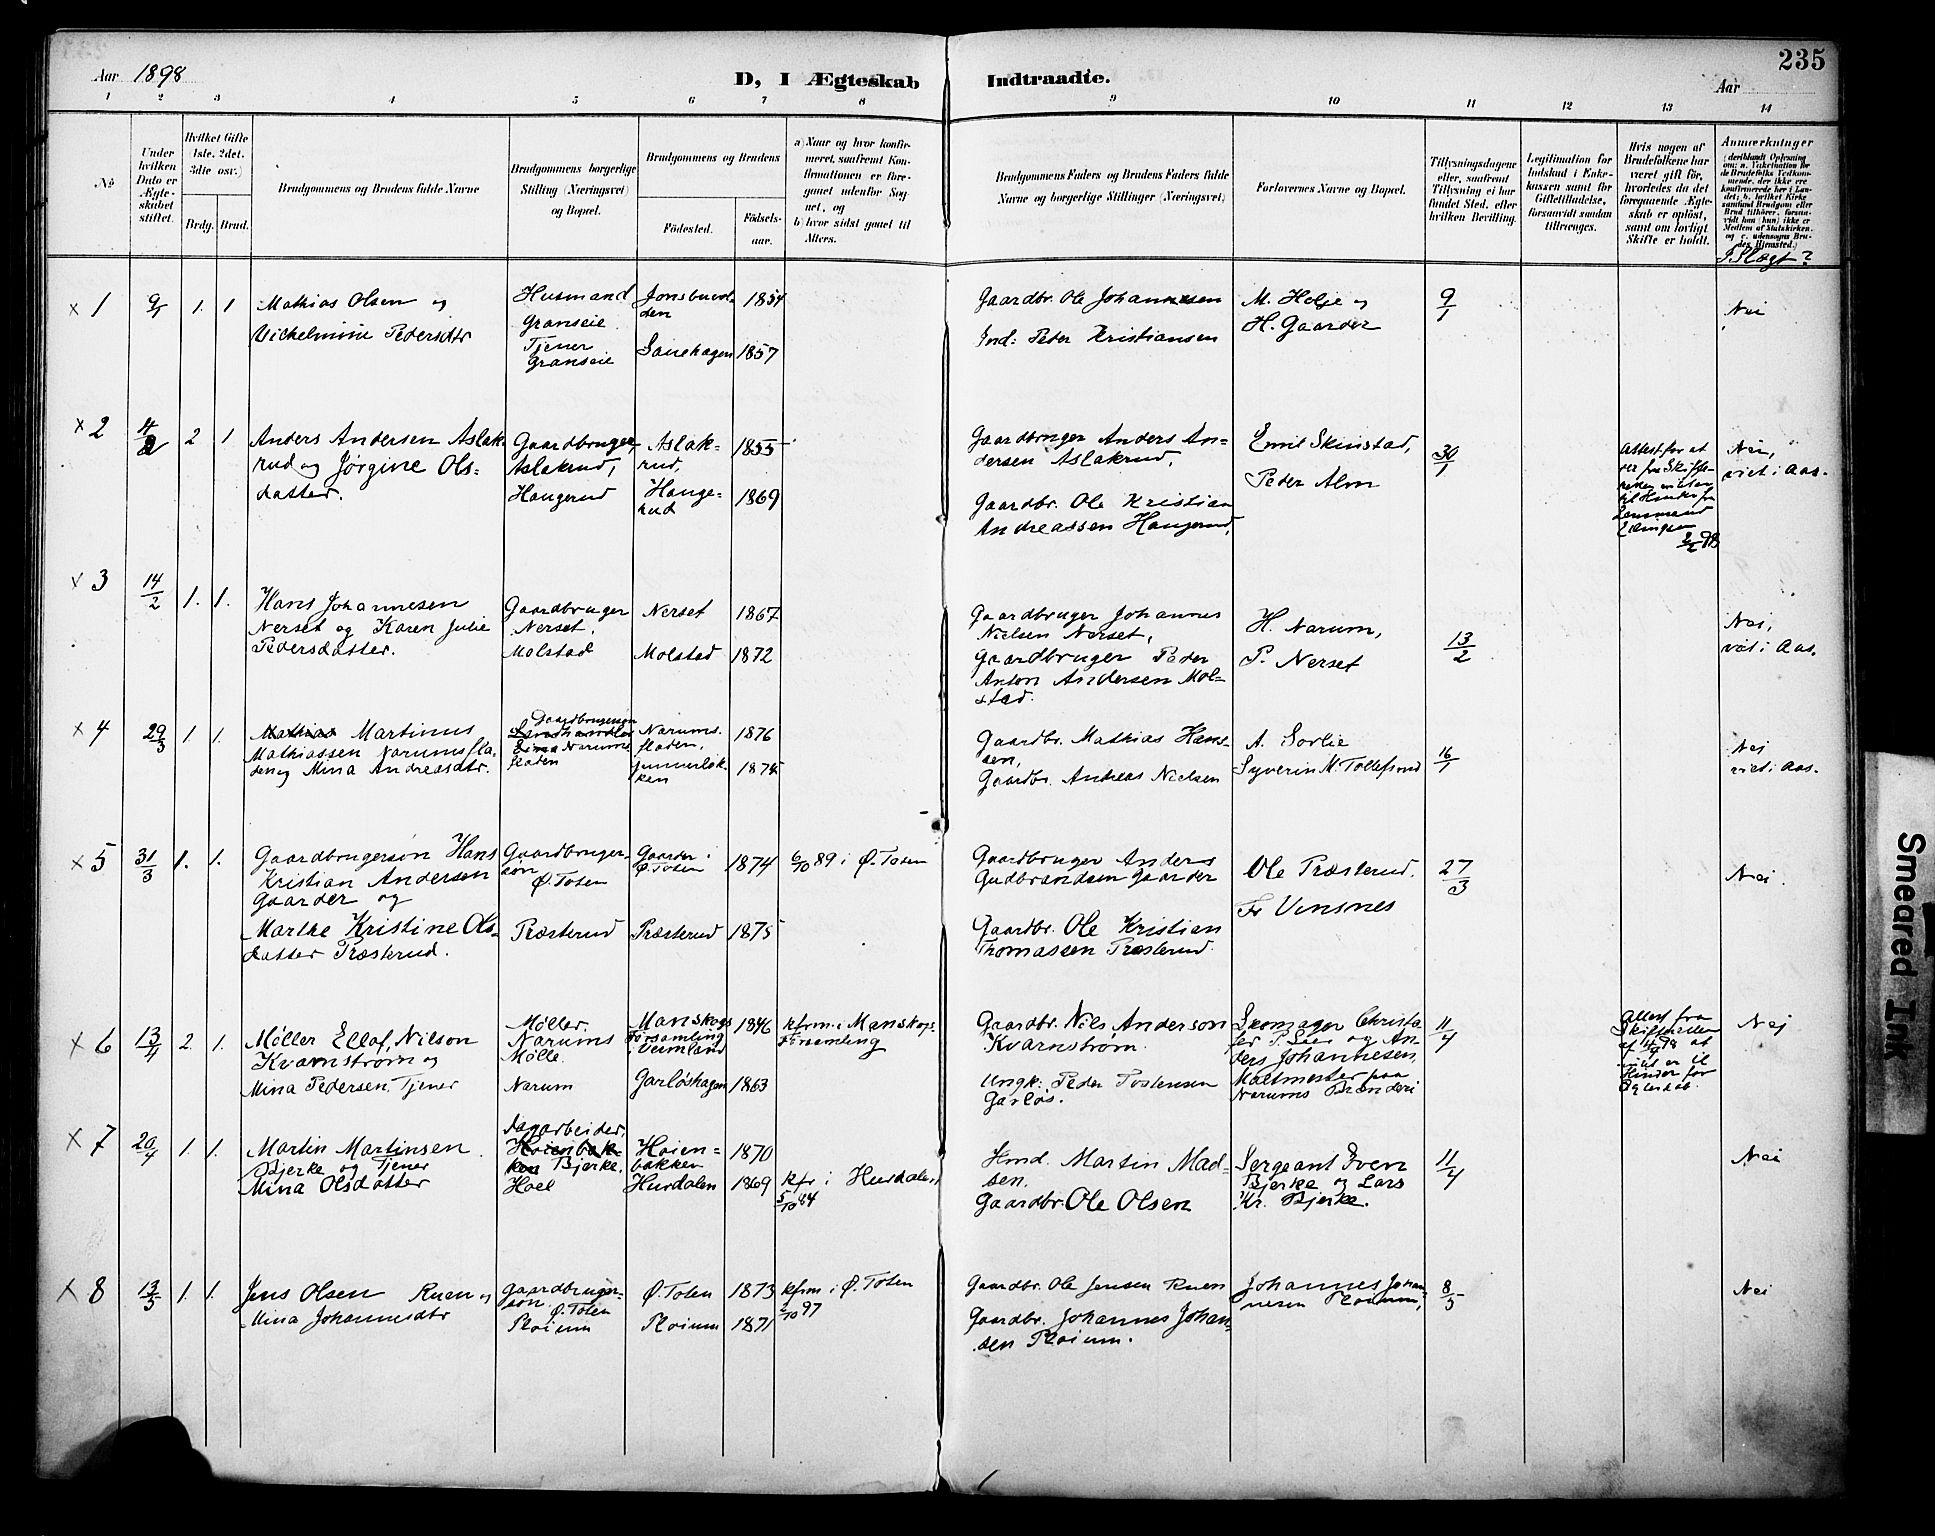 SAH, Vestre Toten prestekontor, H/Ha/Haa/L0013: Ministerialbok nr. 13, 1895-1911, s. 235